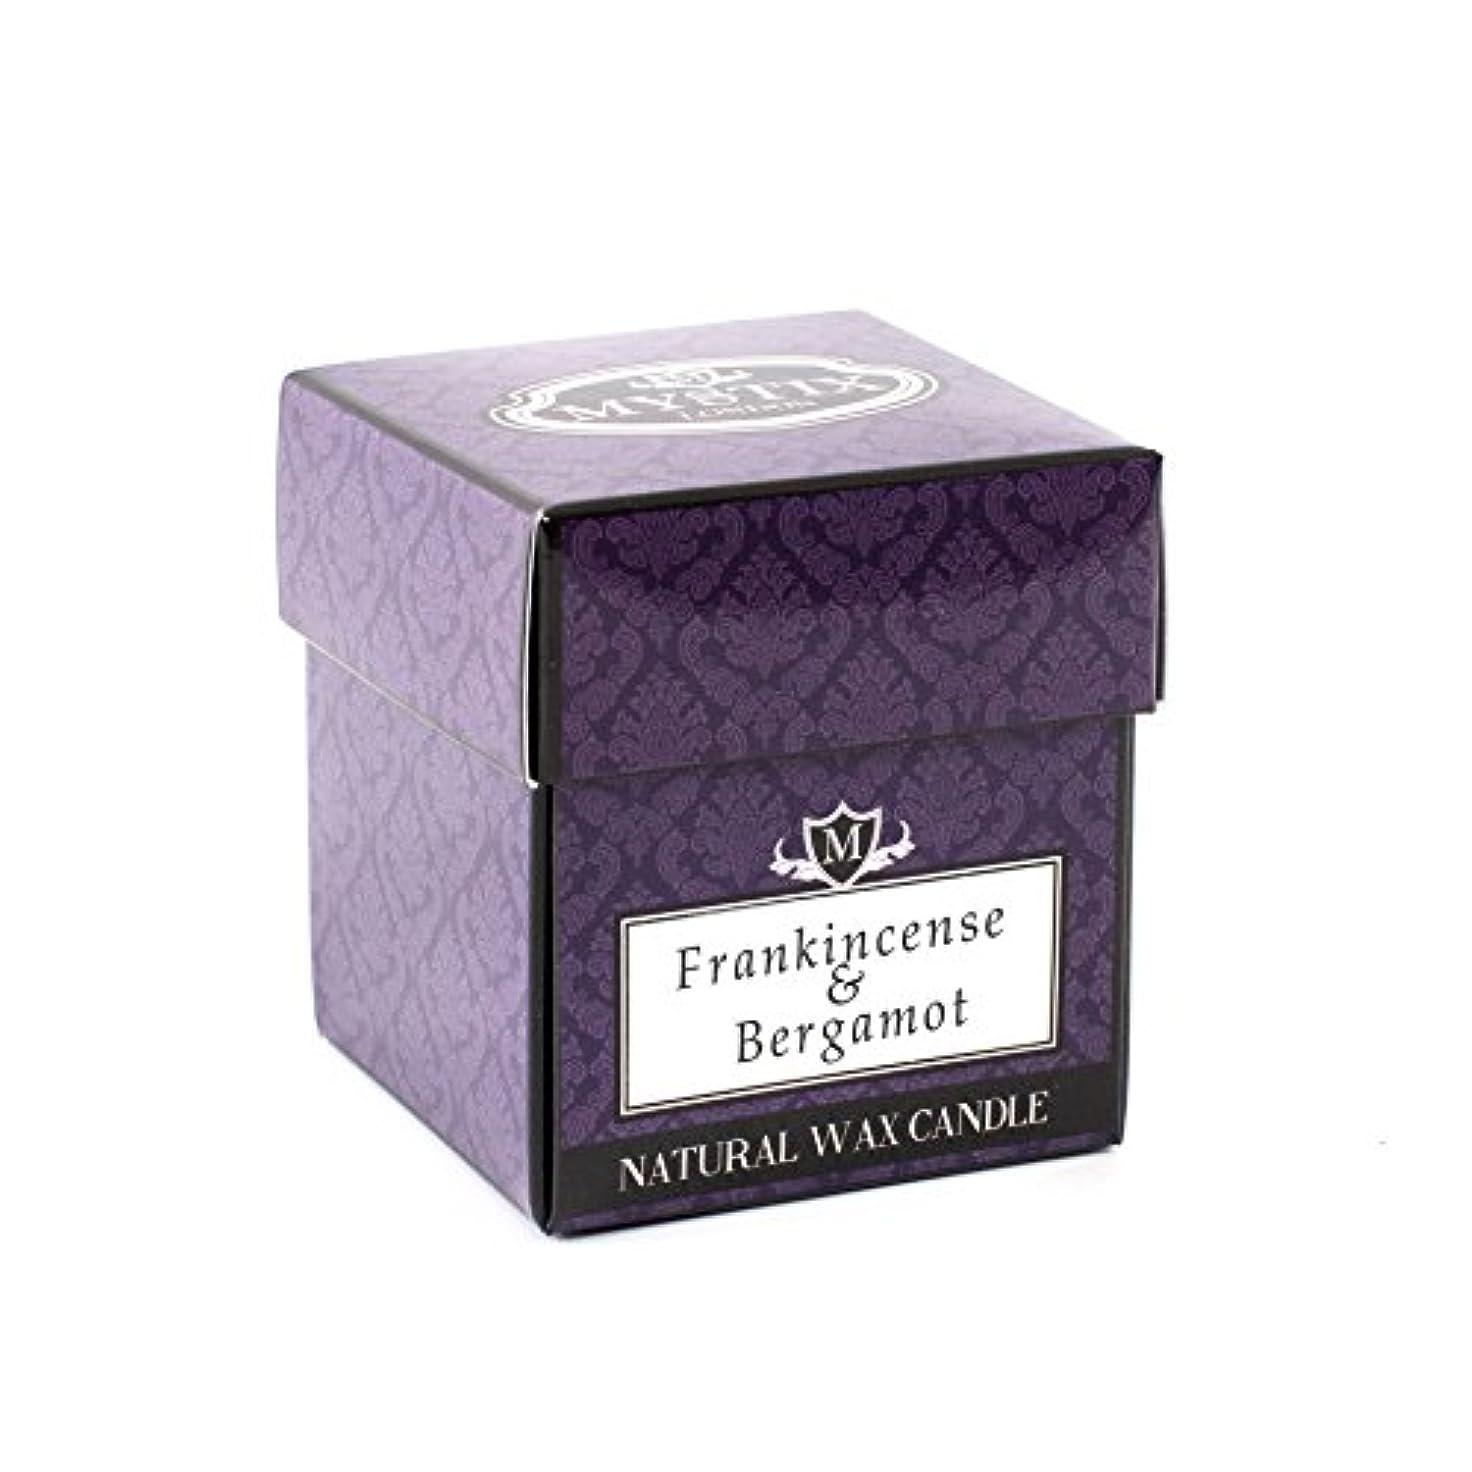 Mystix London | Frankincense & Bergamot Scented Candle x 5